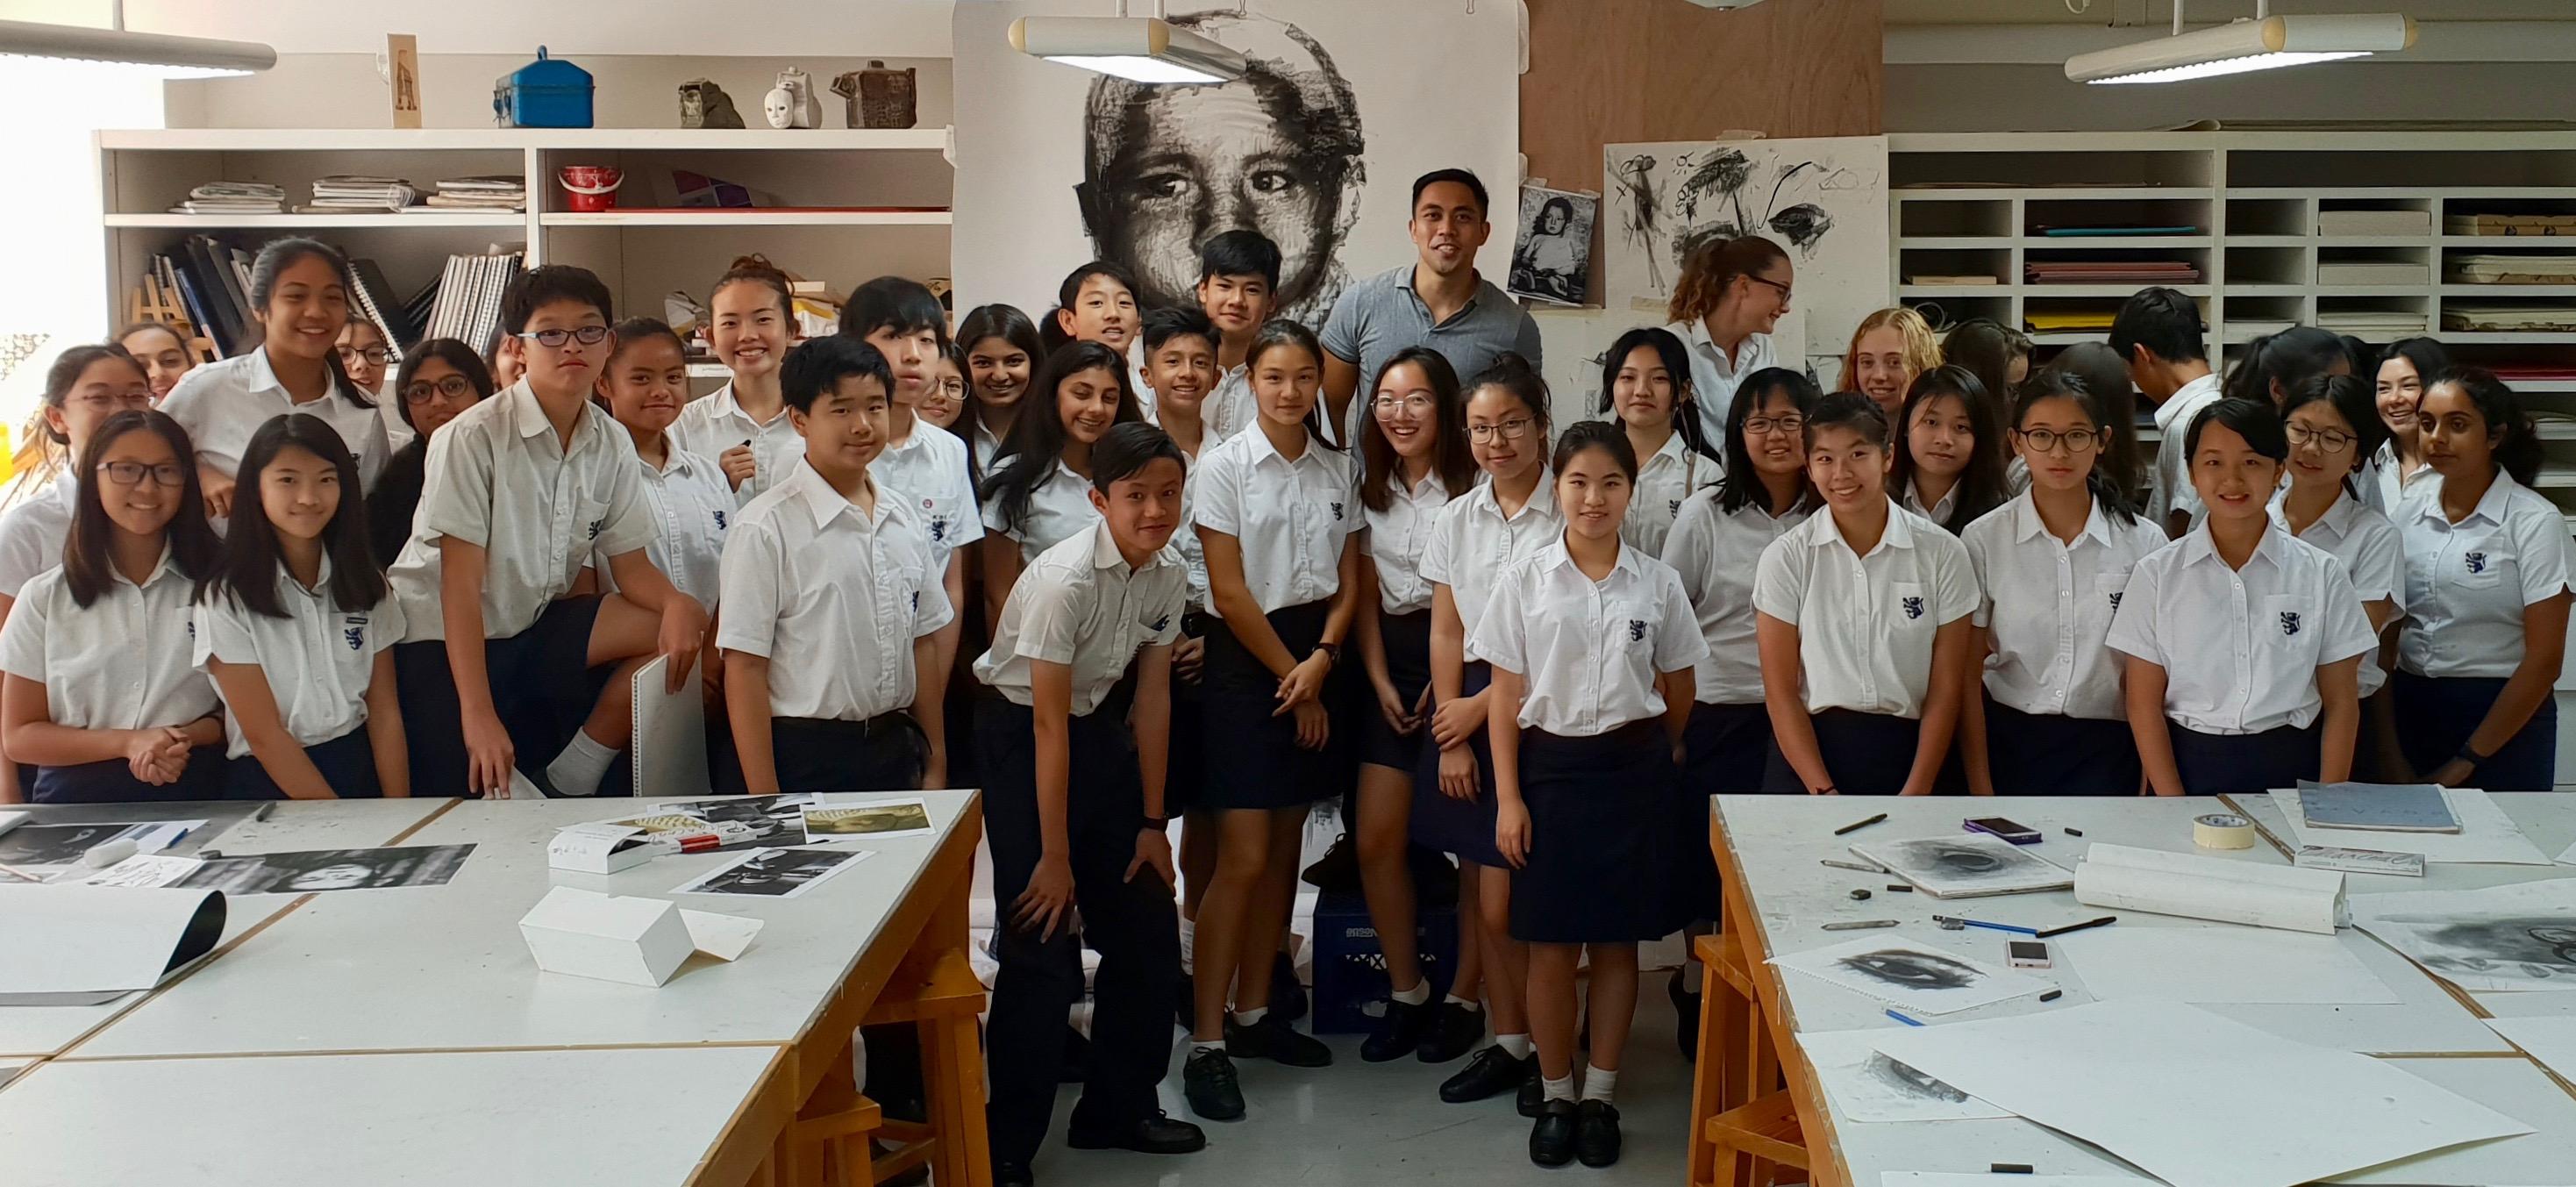 kristone capistrano KGV King George V International School Artist Visit Workshop